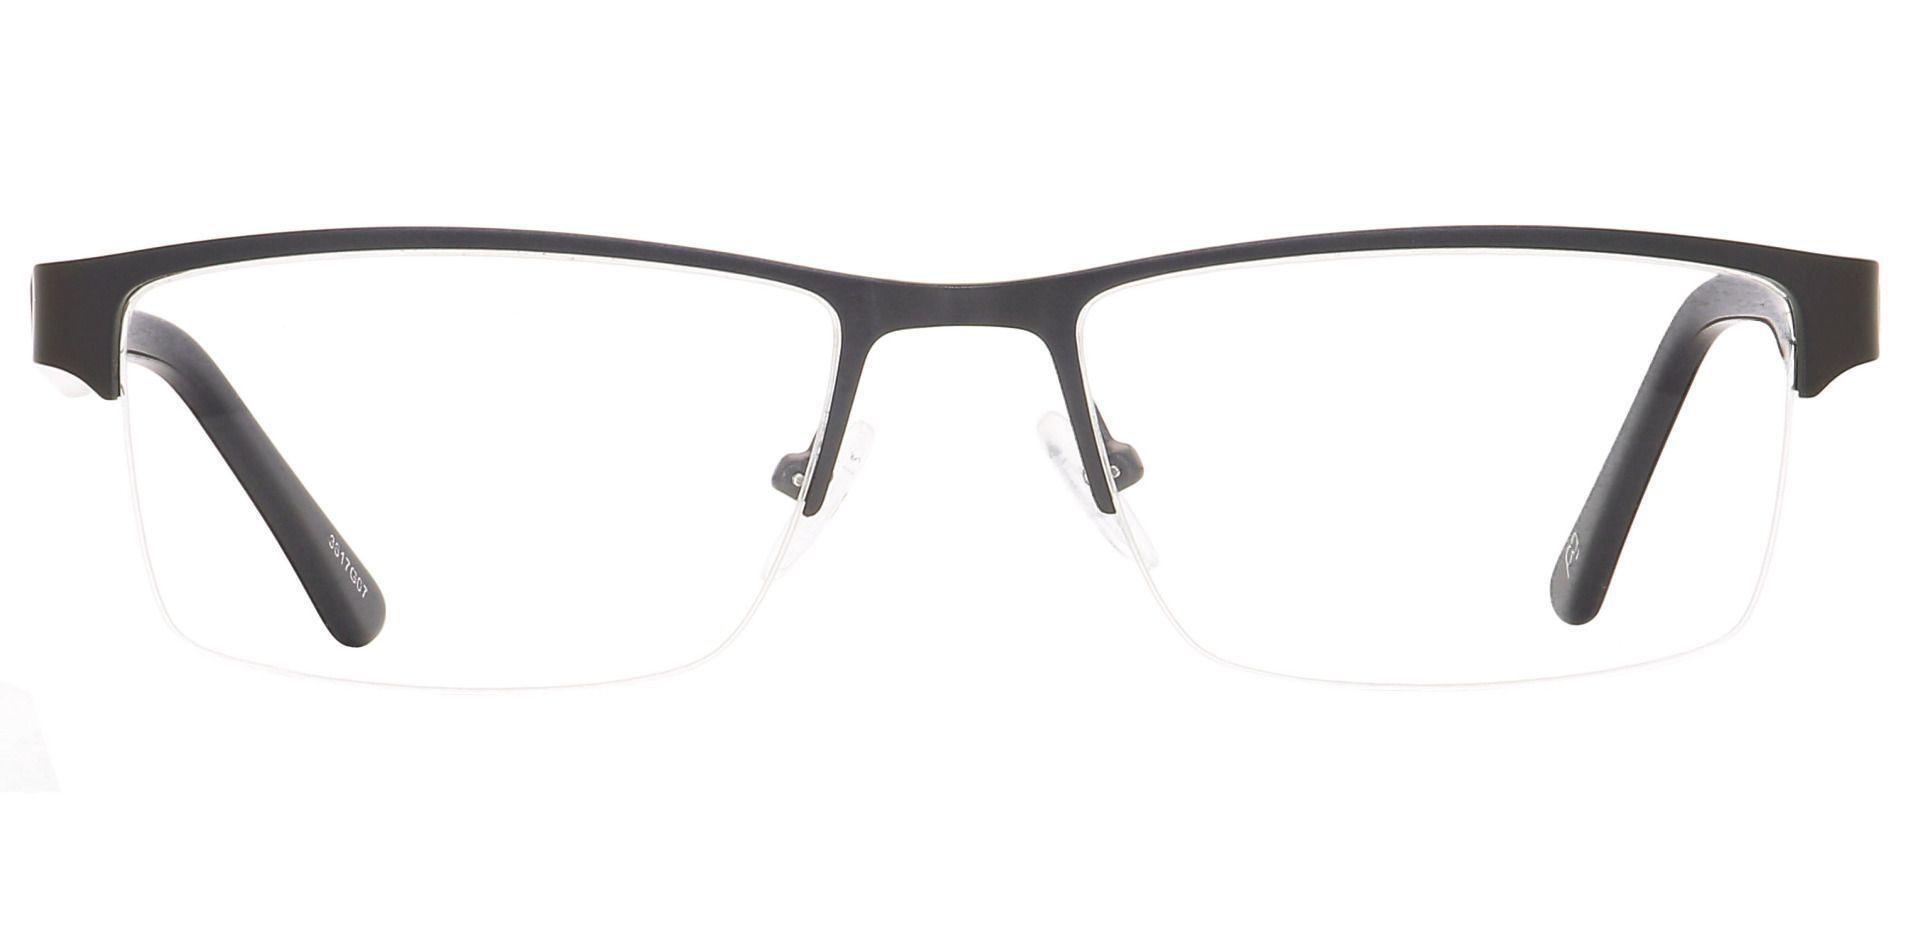 Kerwin Rectangle Lined Bifocal Glasses - Gray